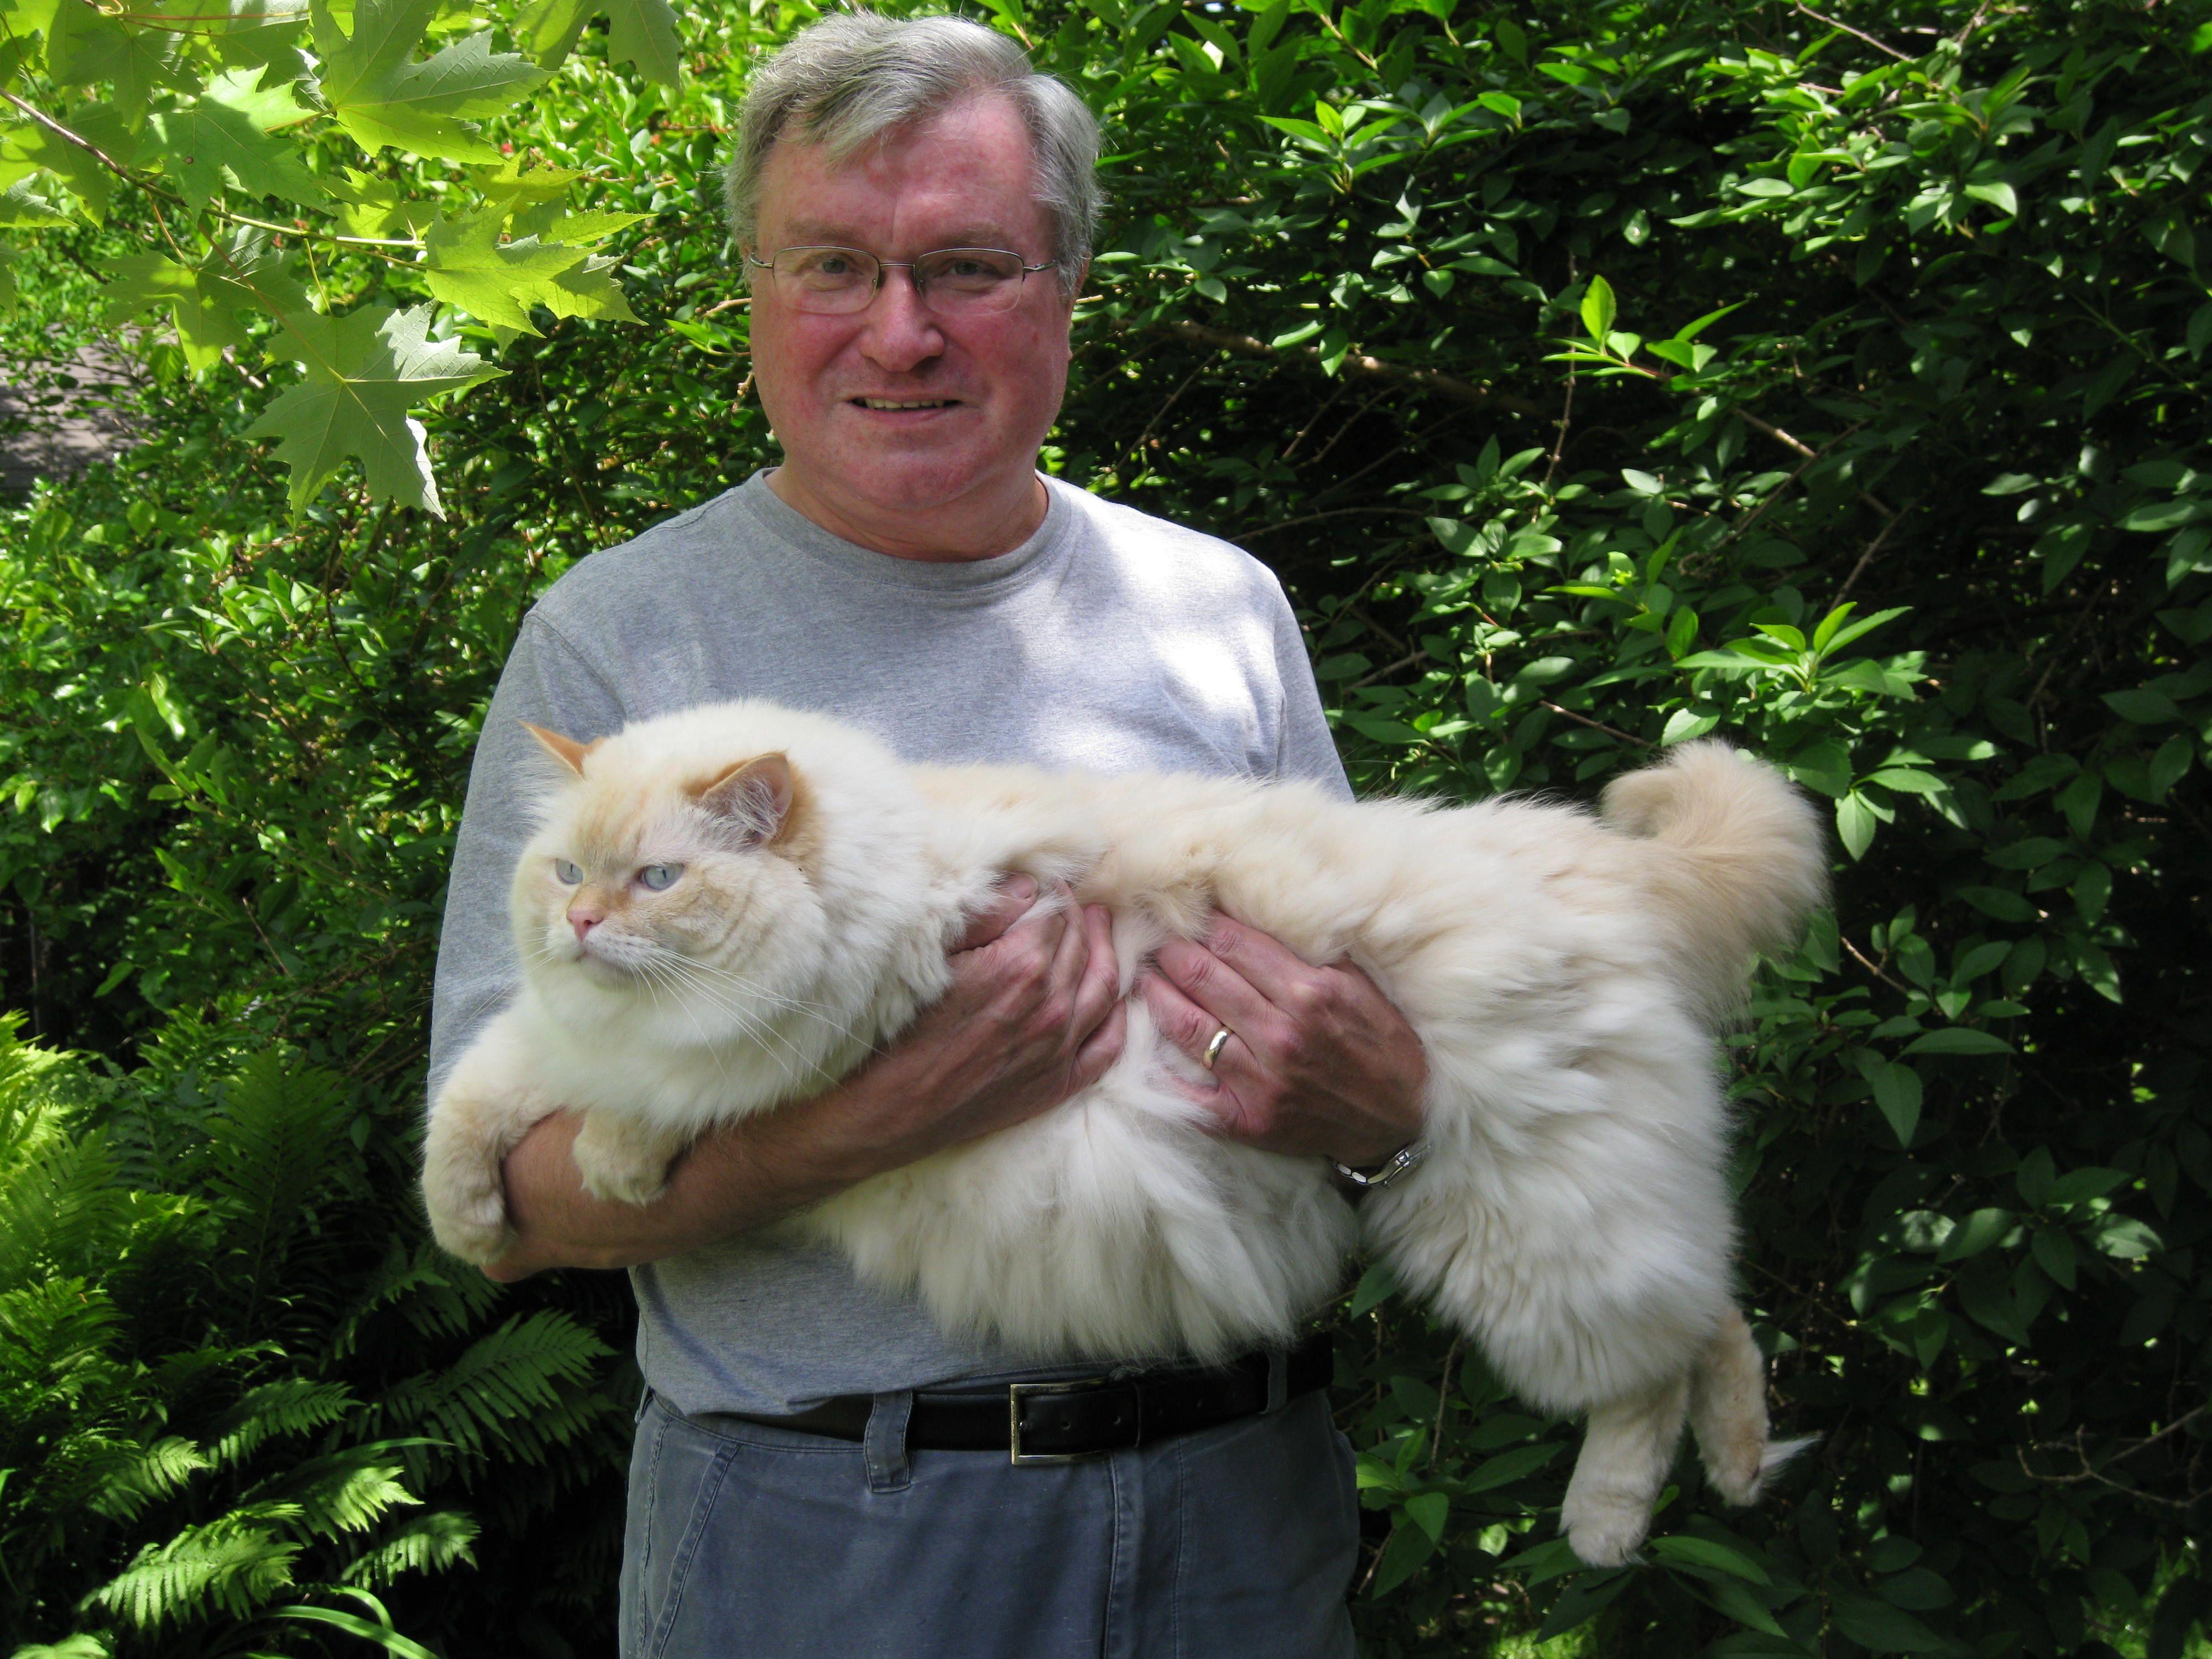 kittens to adopt near me